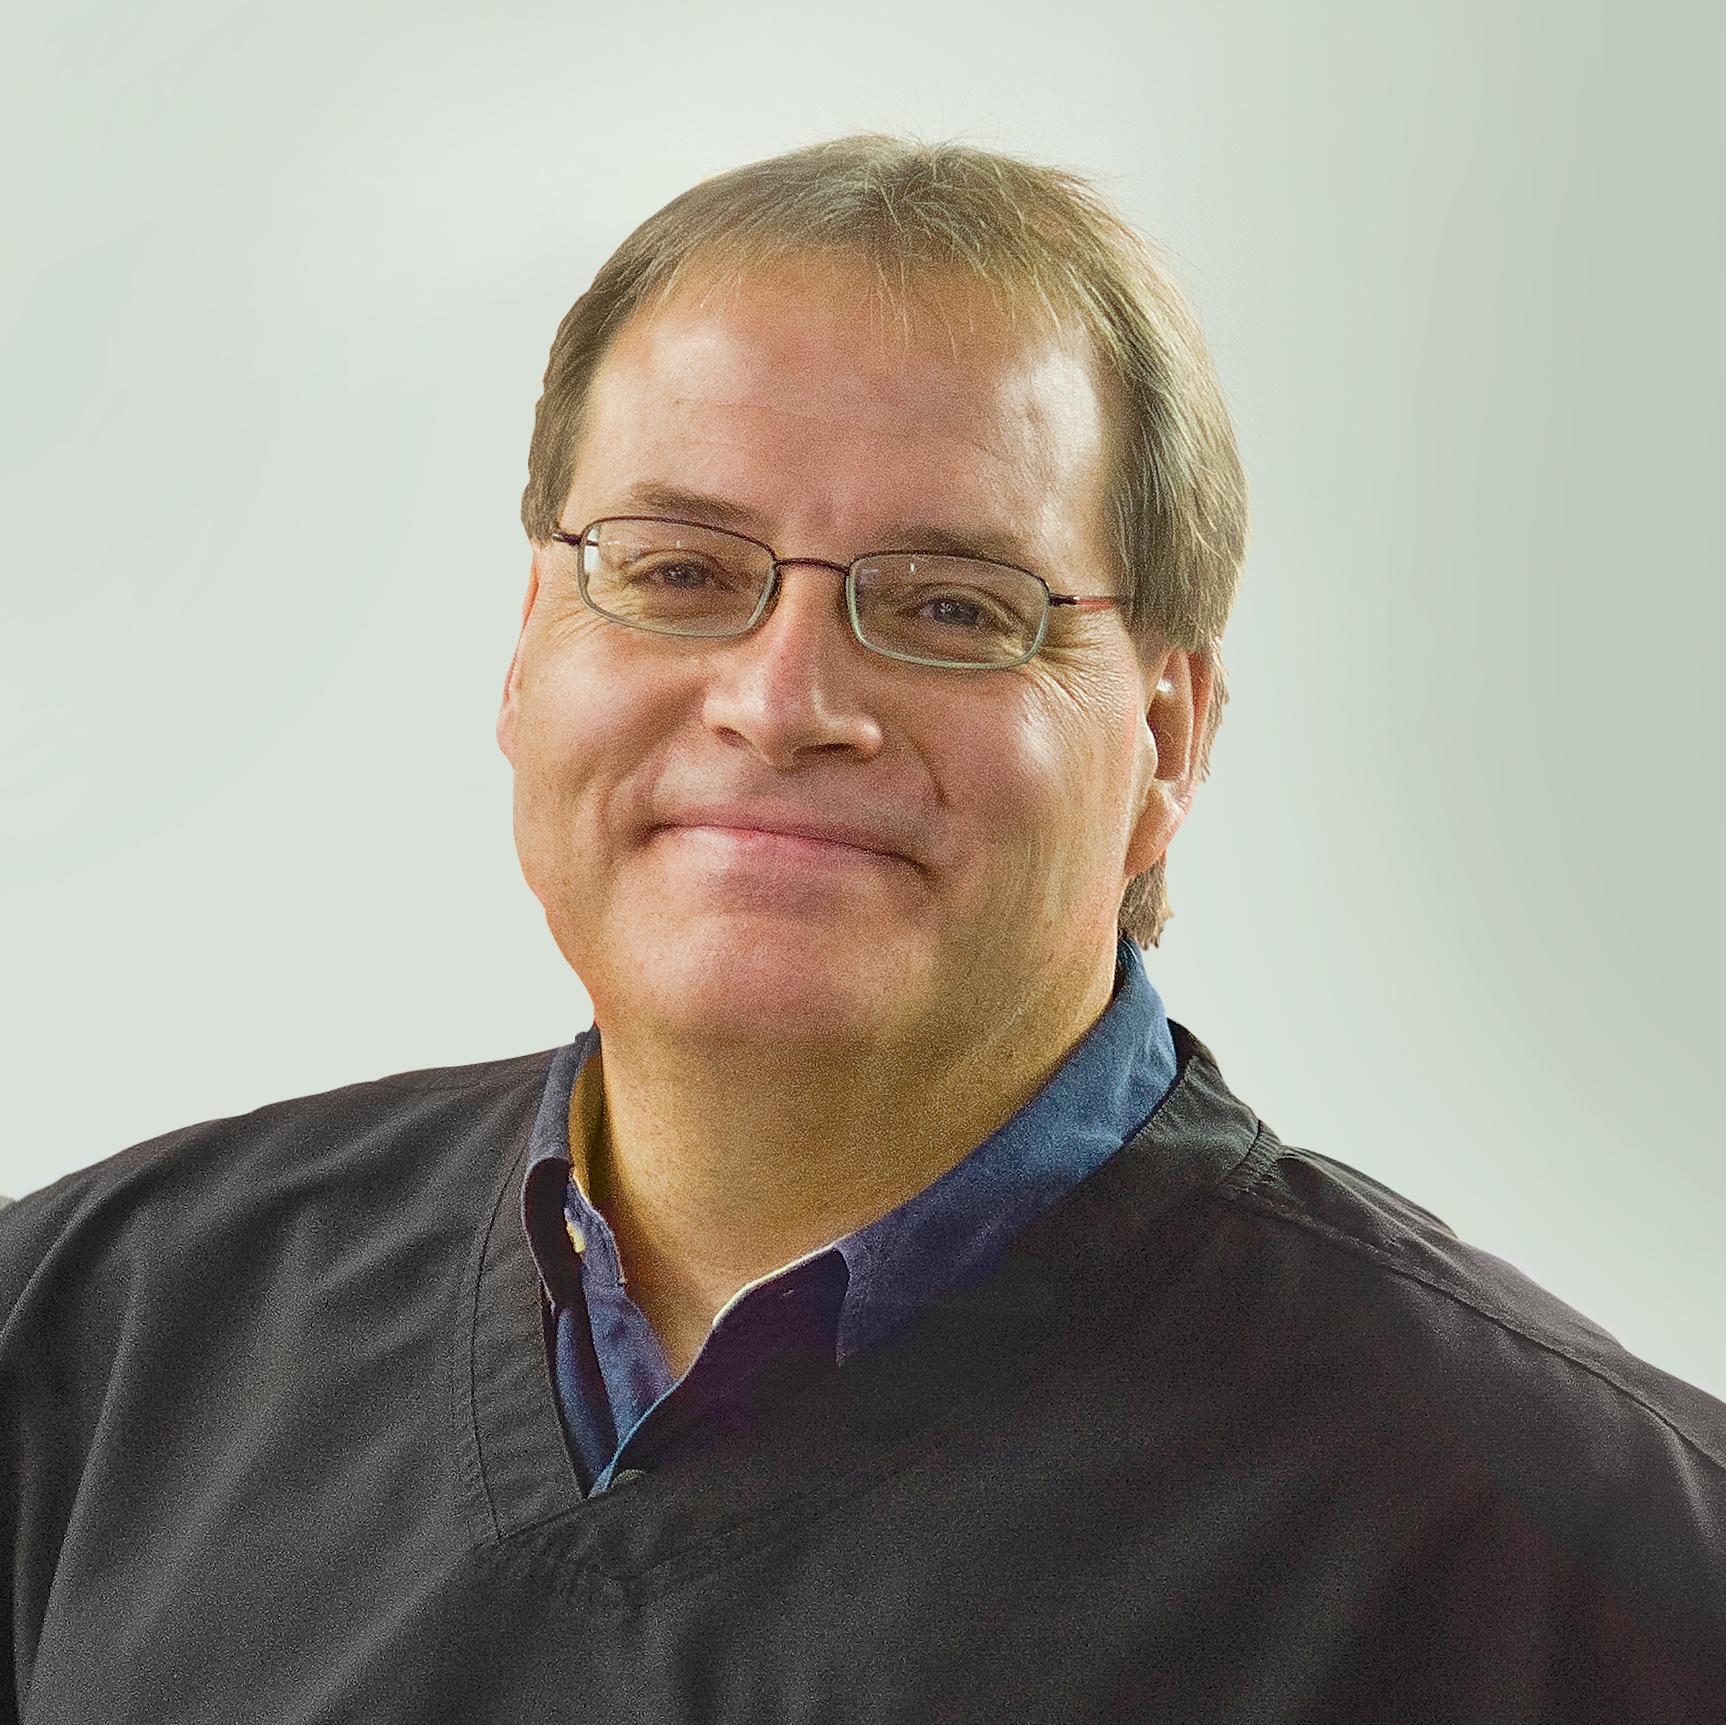 Randy Sattler